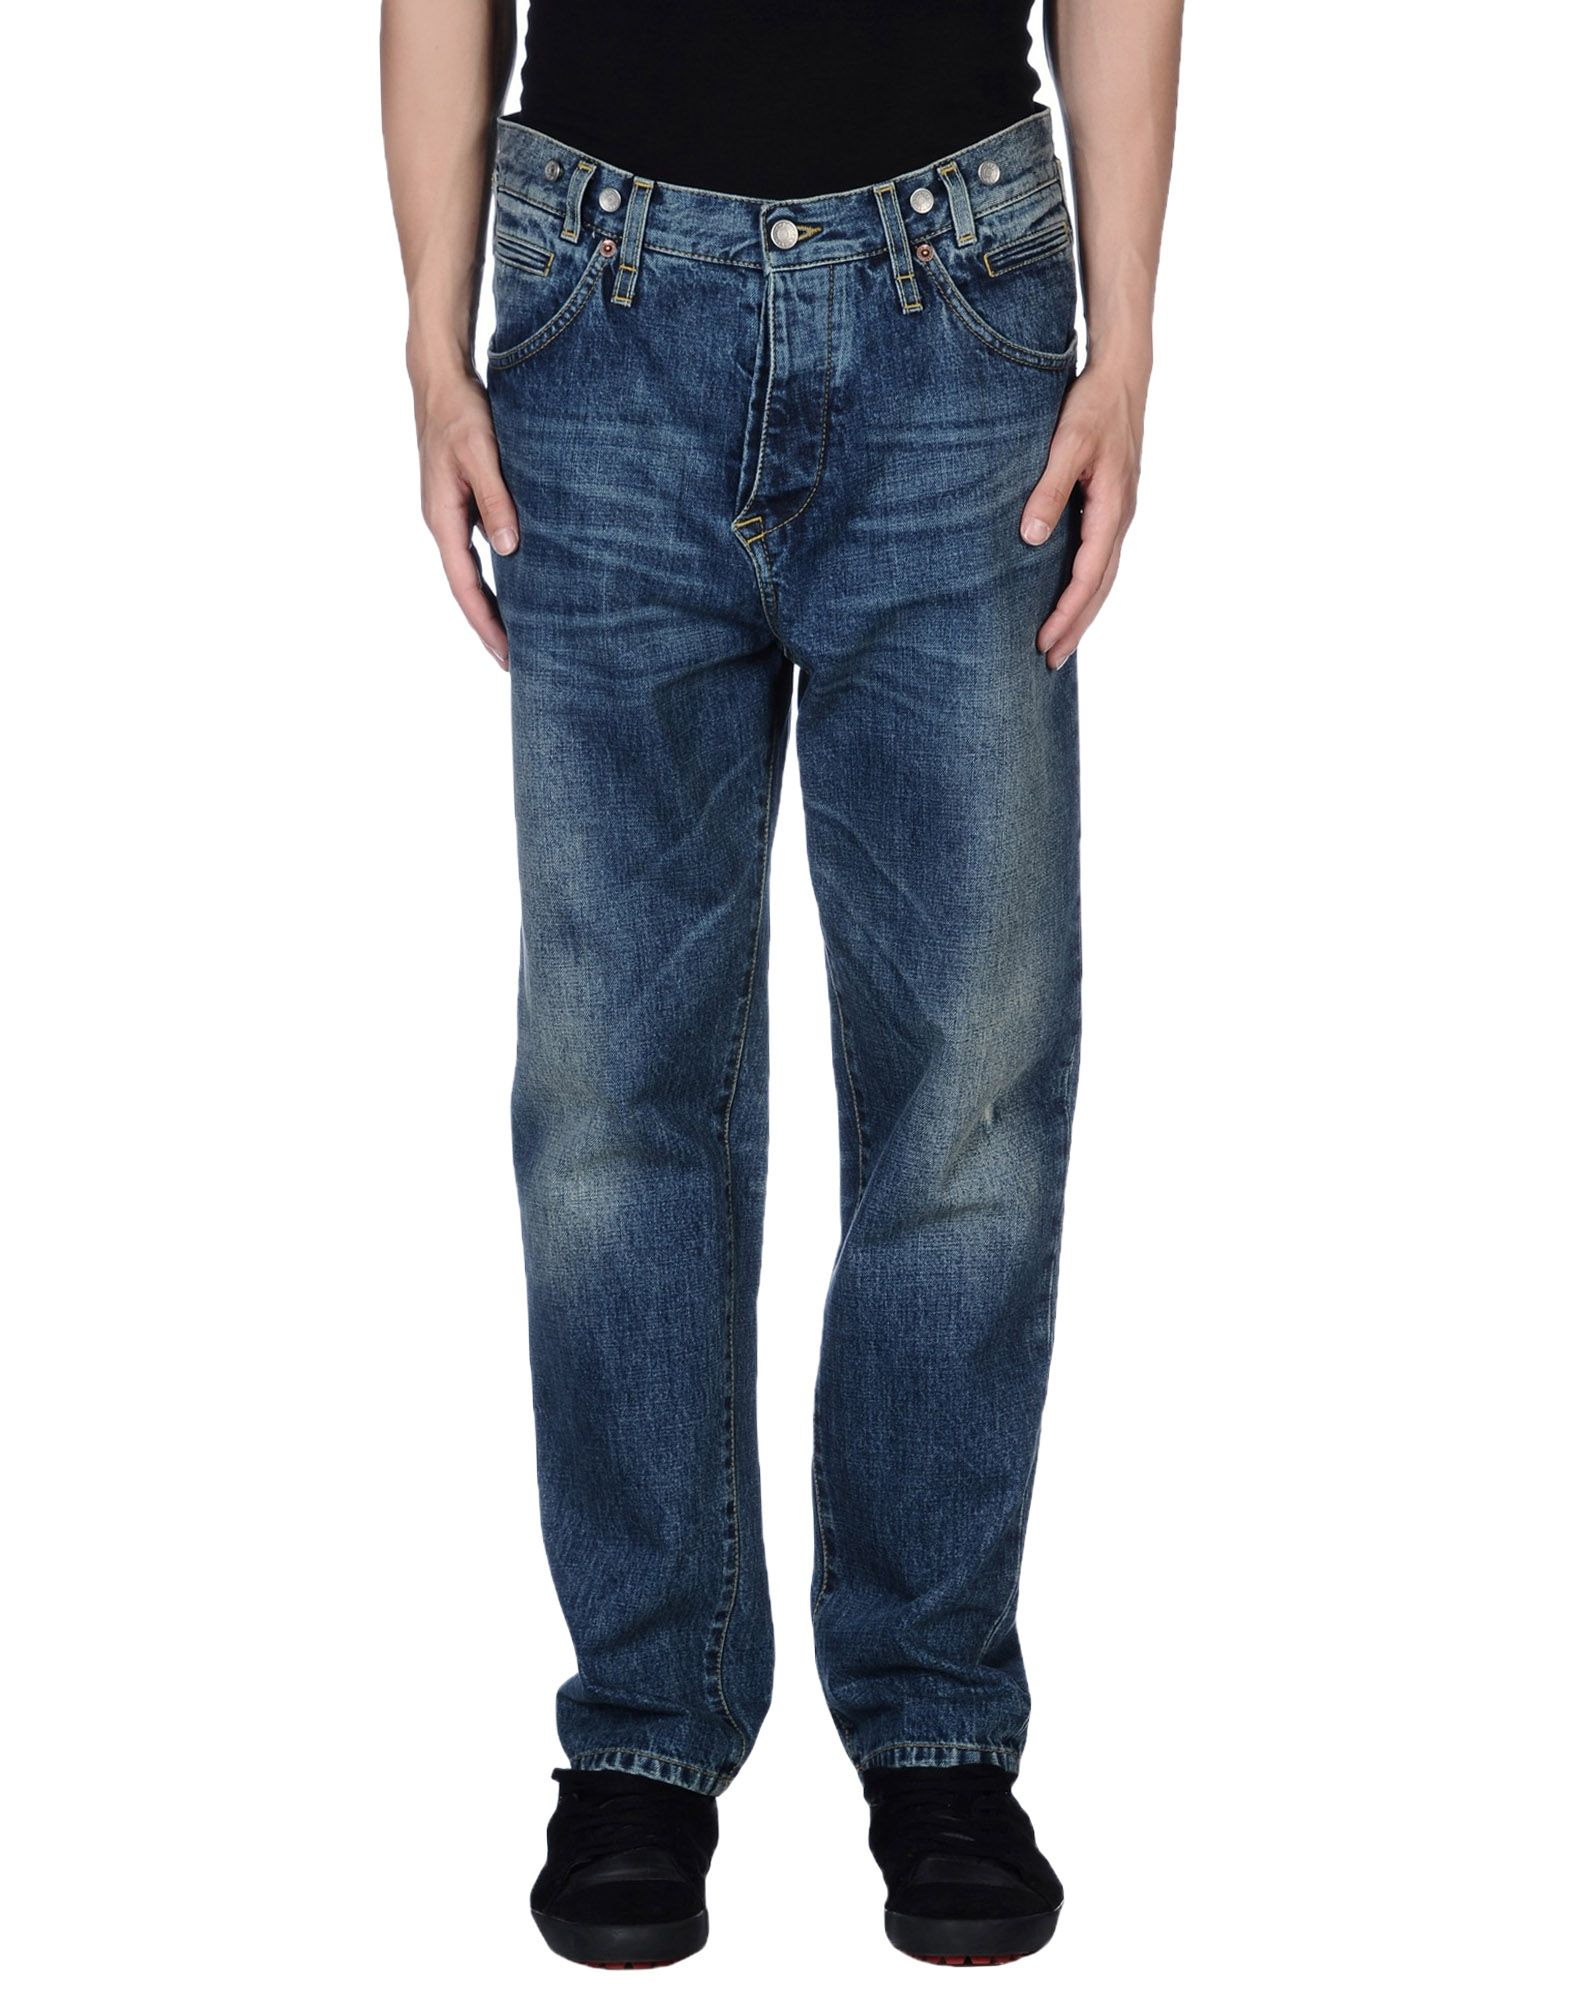 lyst dolce gabbana denim trousers in blue for men. Black Bedroom Furniture Sets. Home Design Ideas